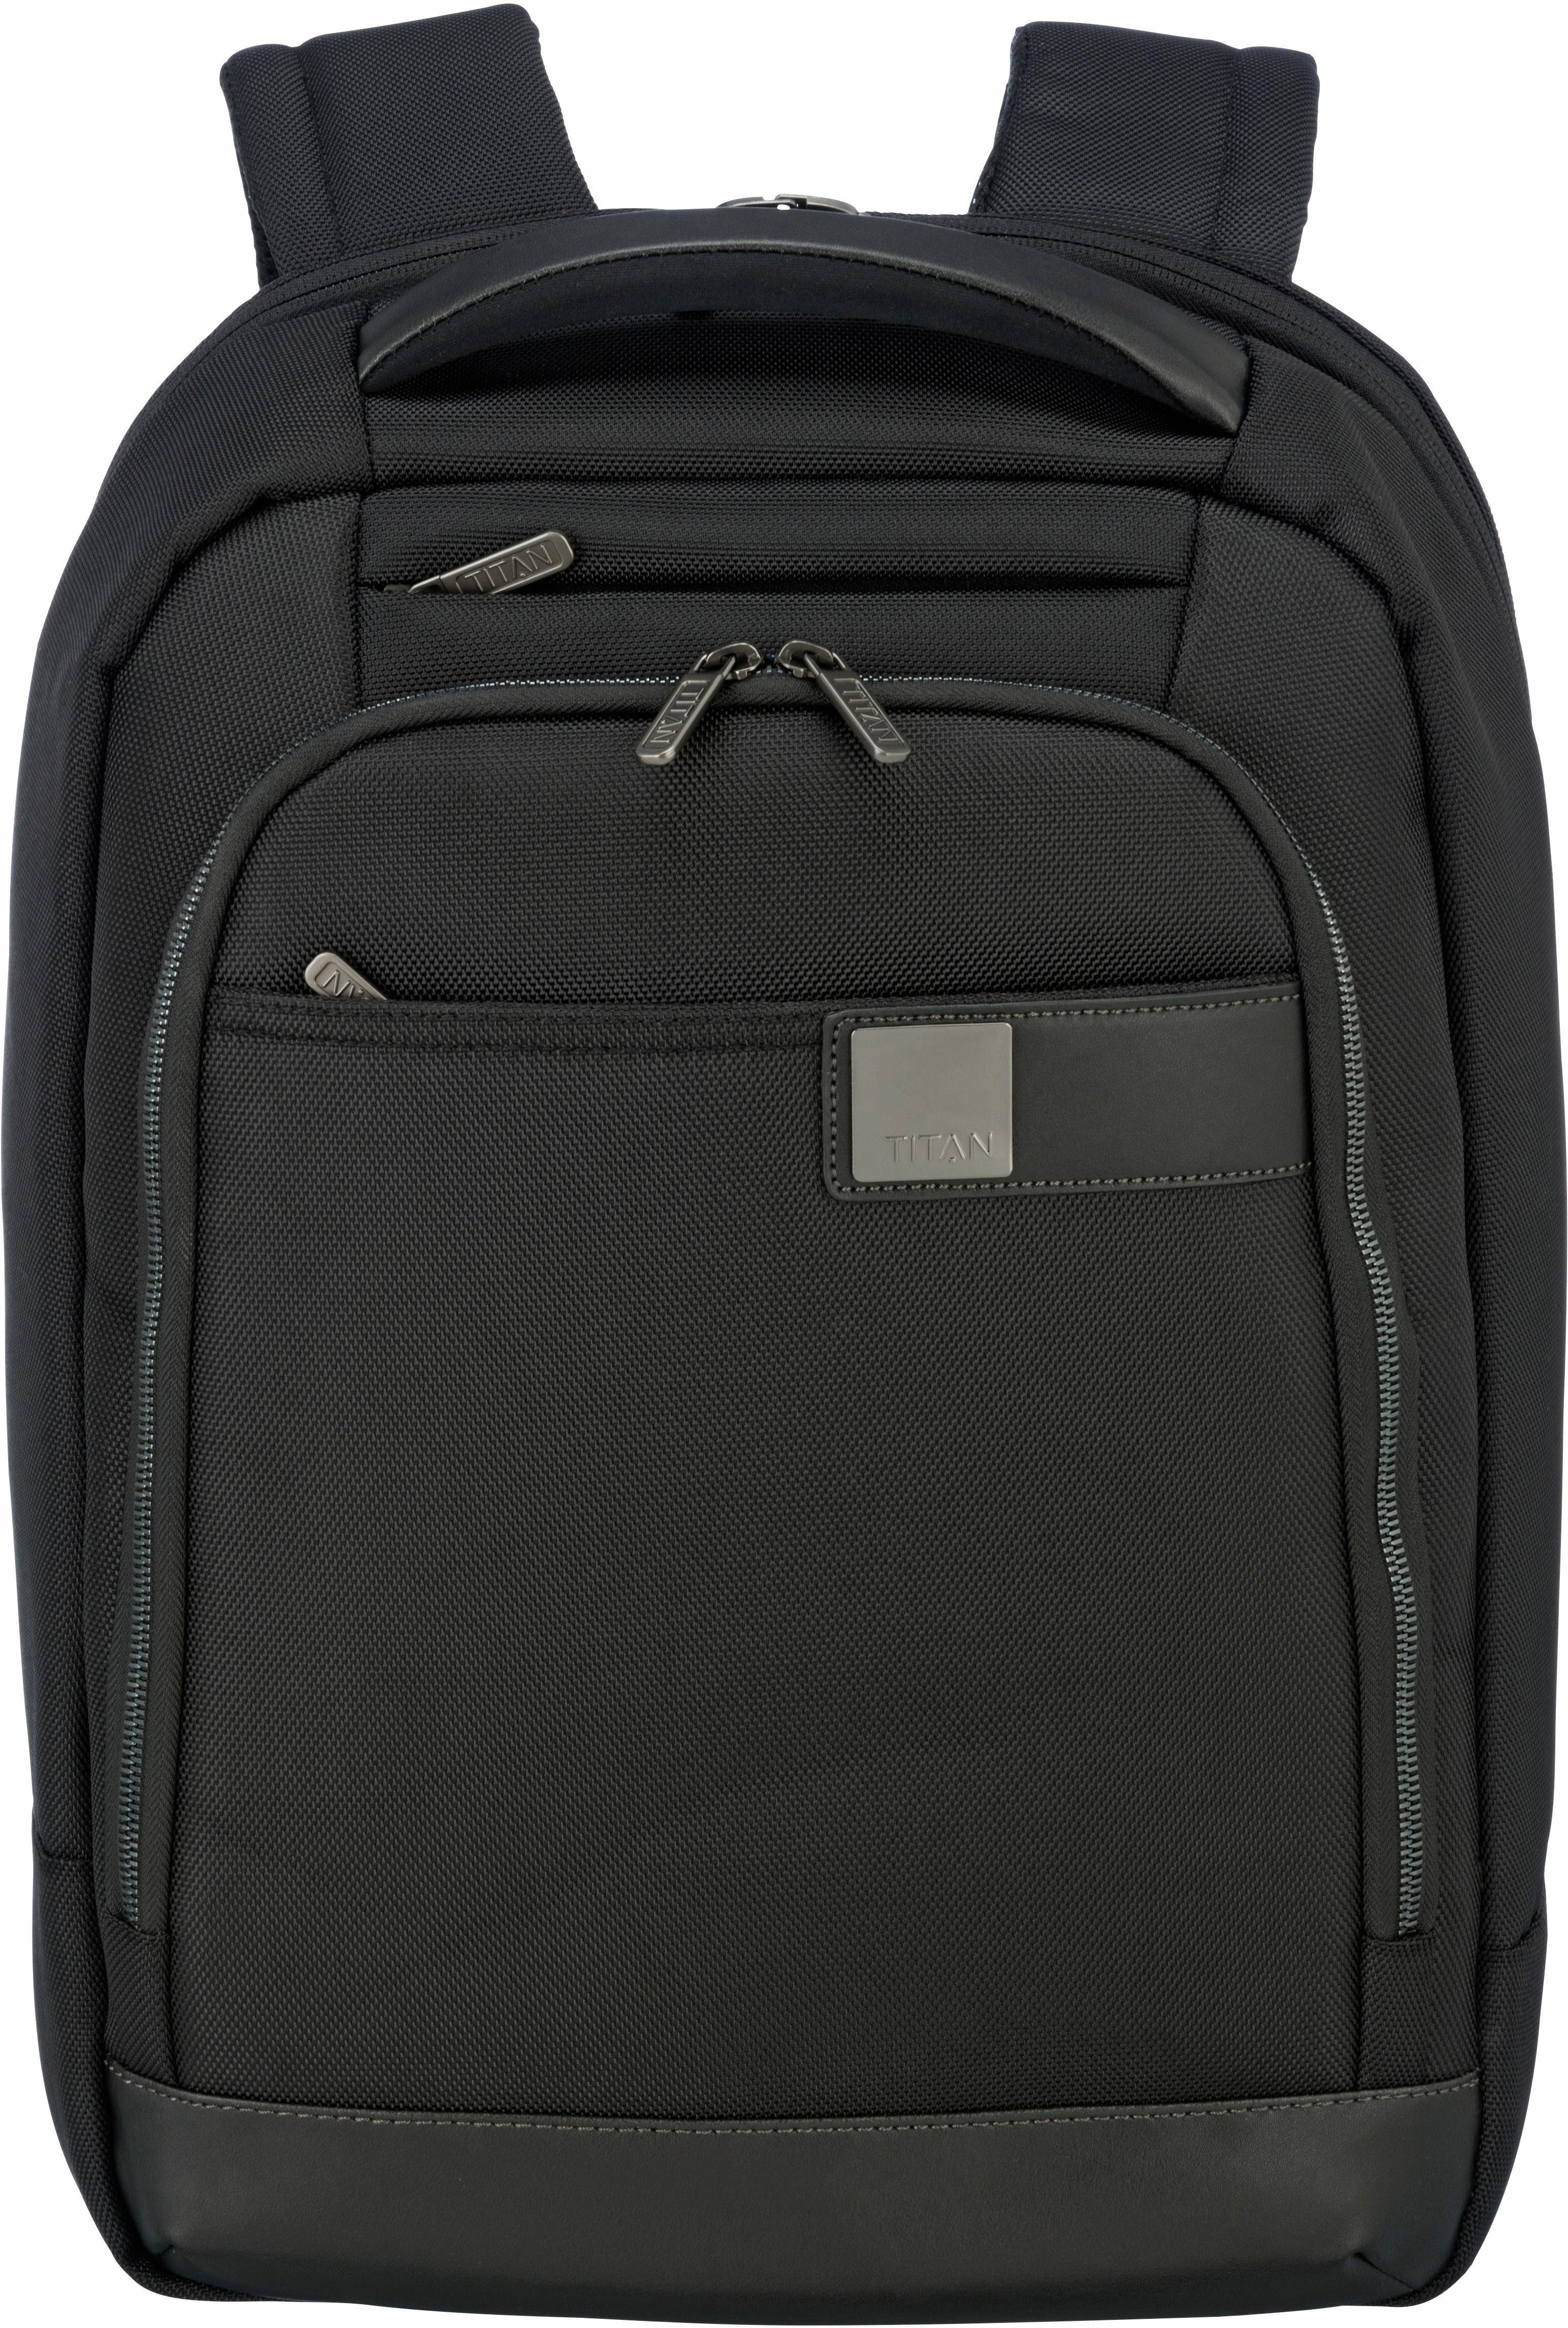 TITAN® Laptoprucksack »Power Pack, 44 black«   OTTO